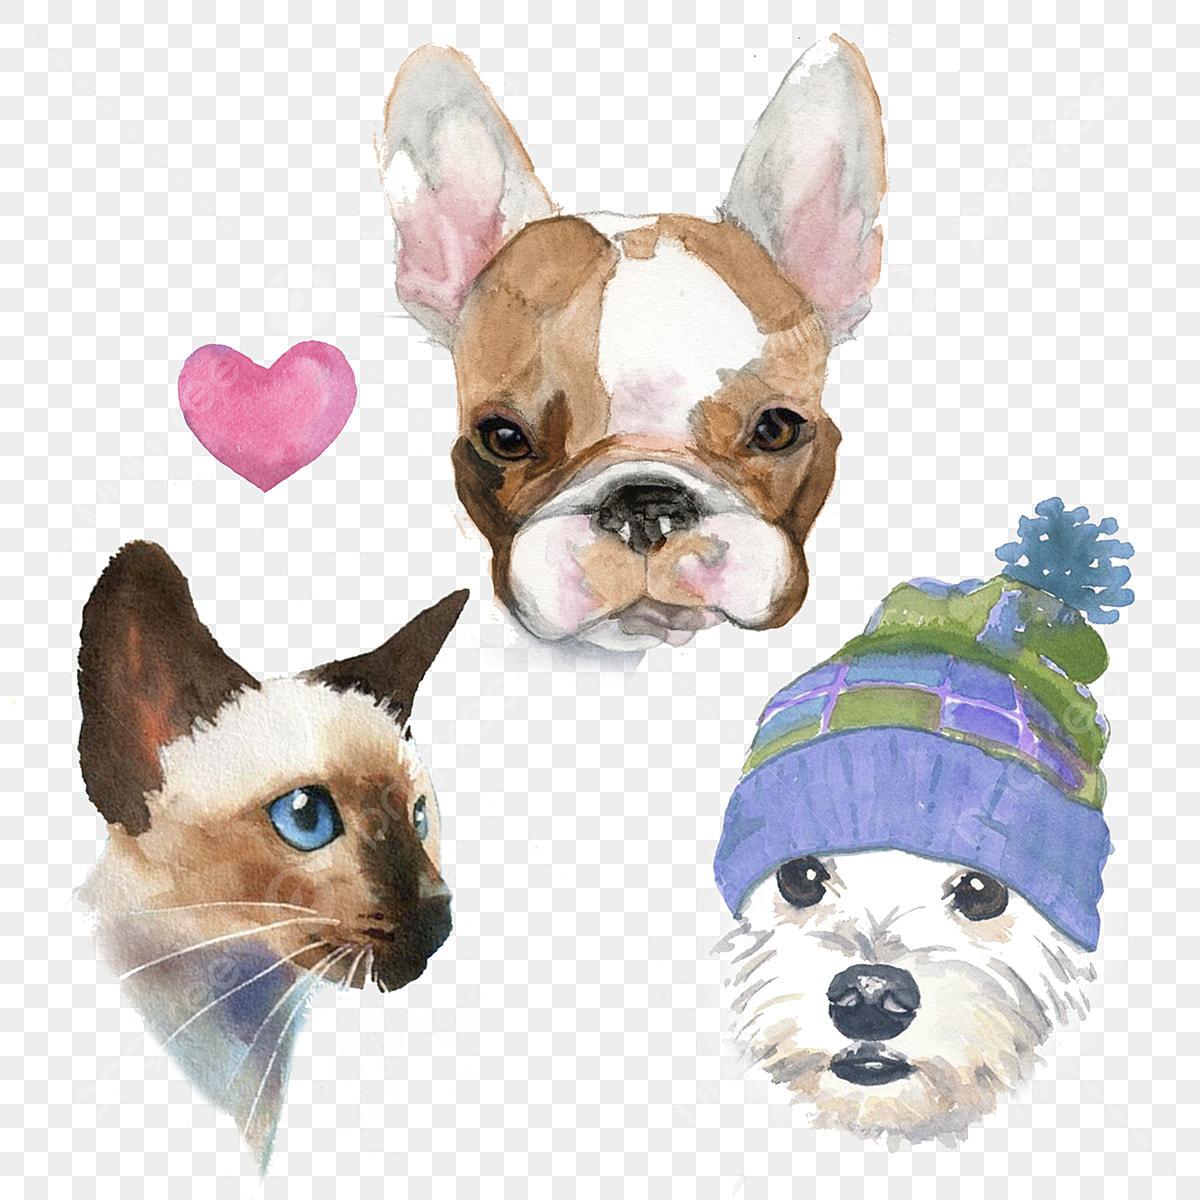 Dibujado A Mano Acuarela Dibujos Animados Perro Gato Siames